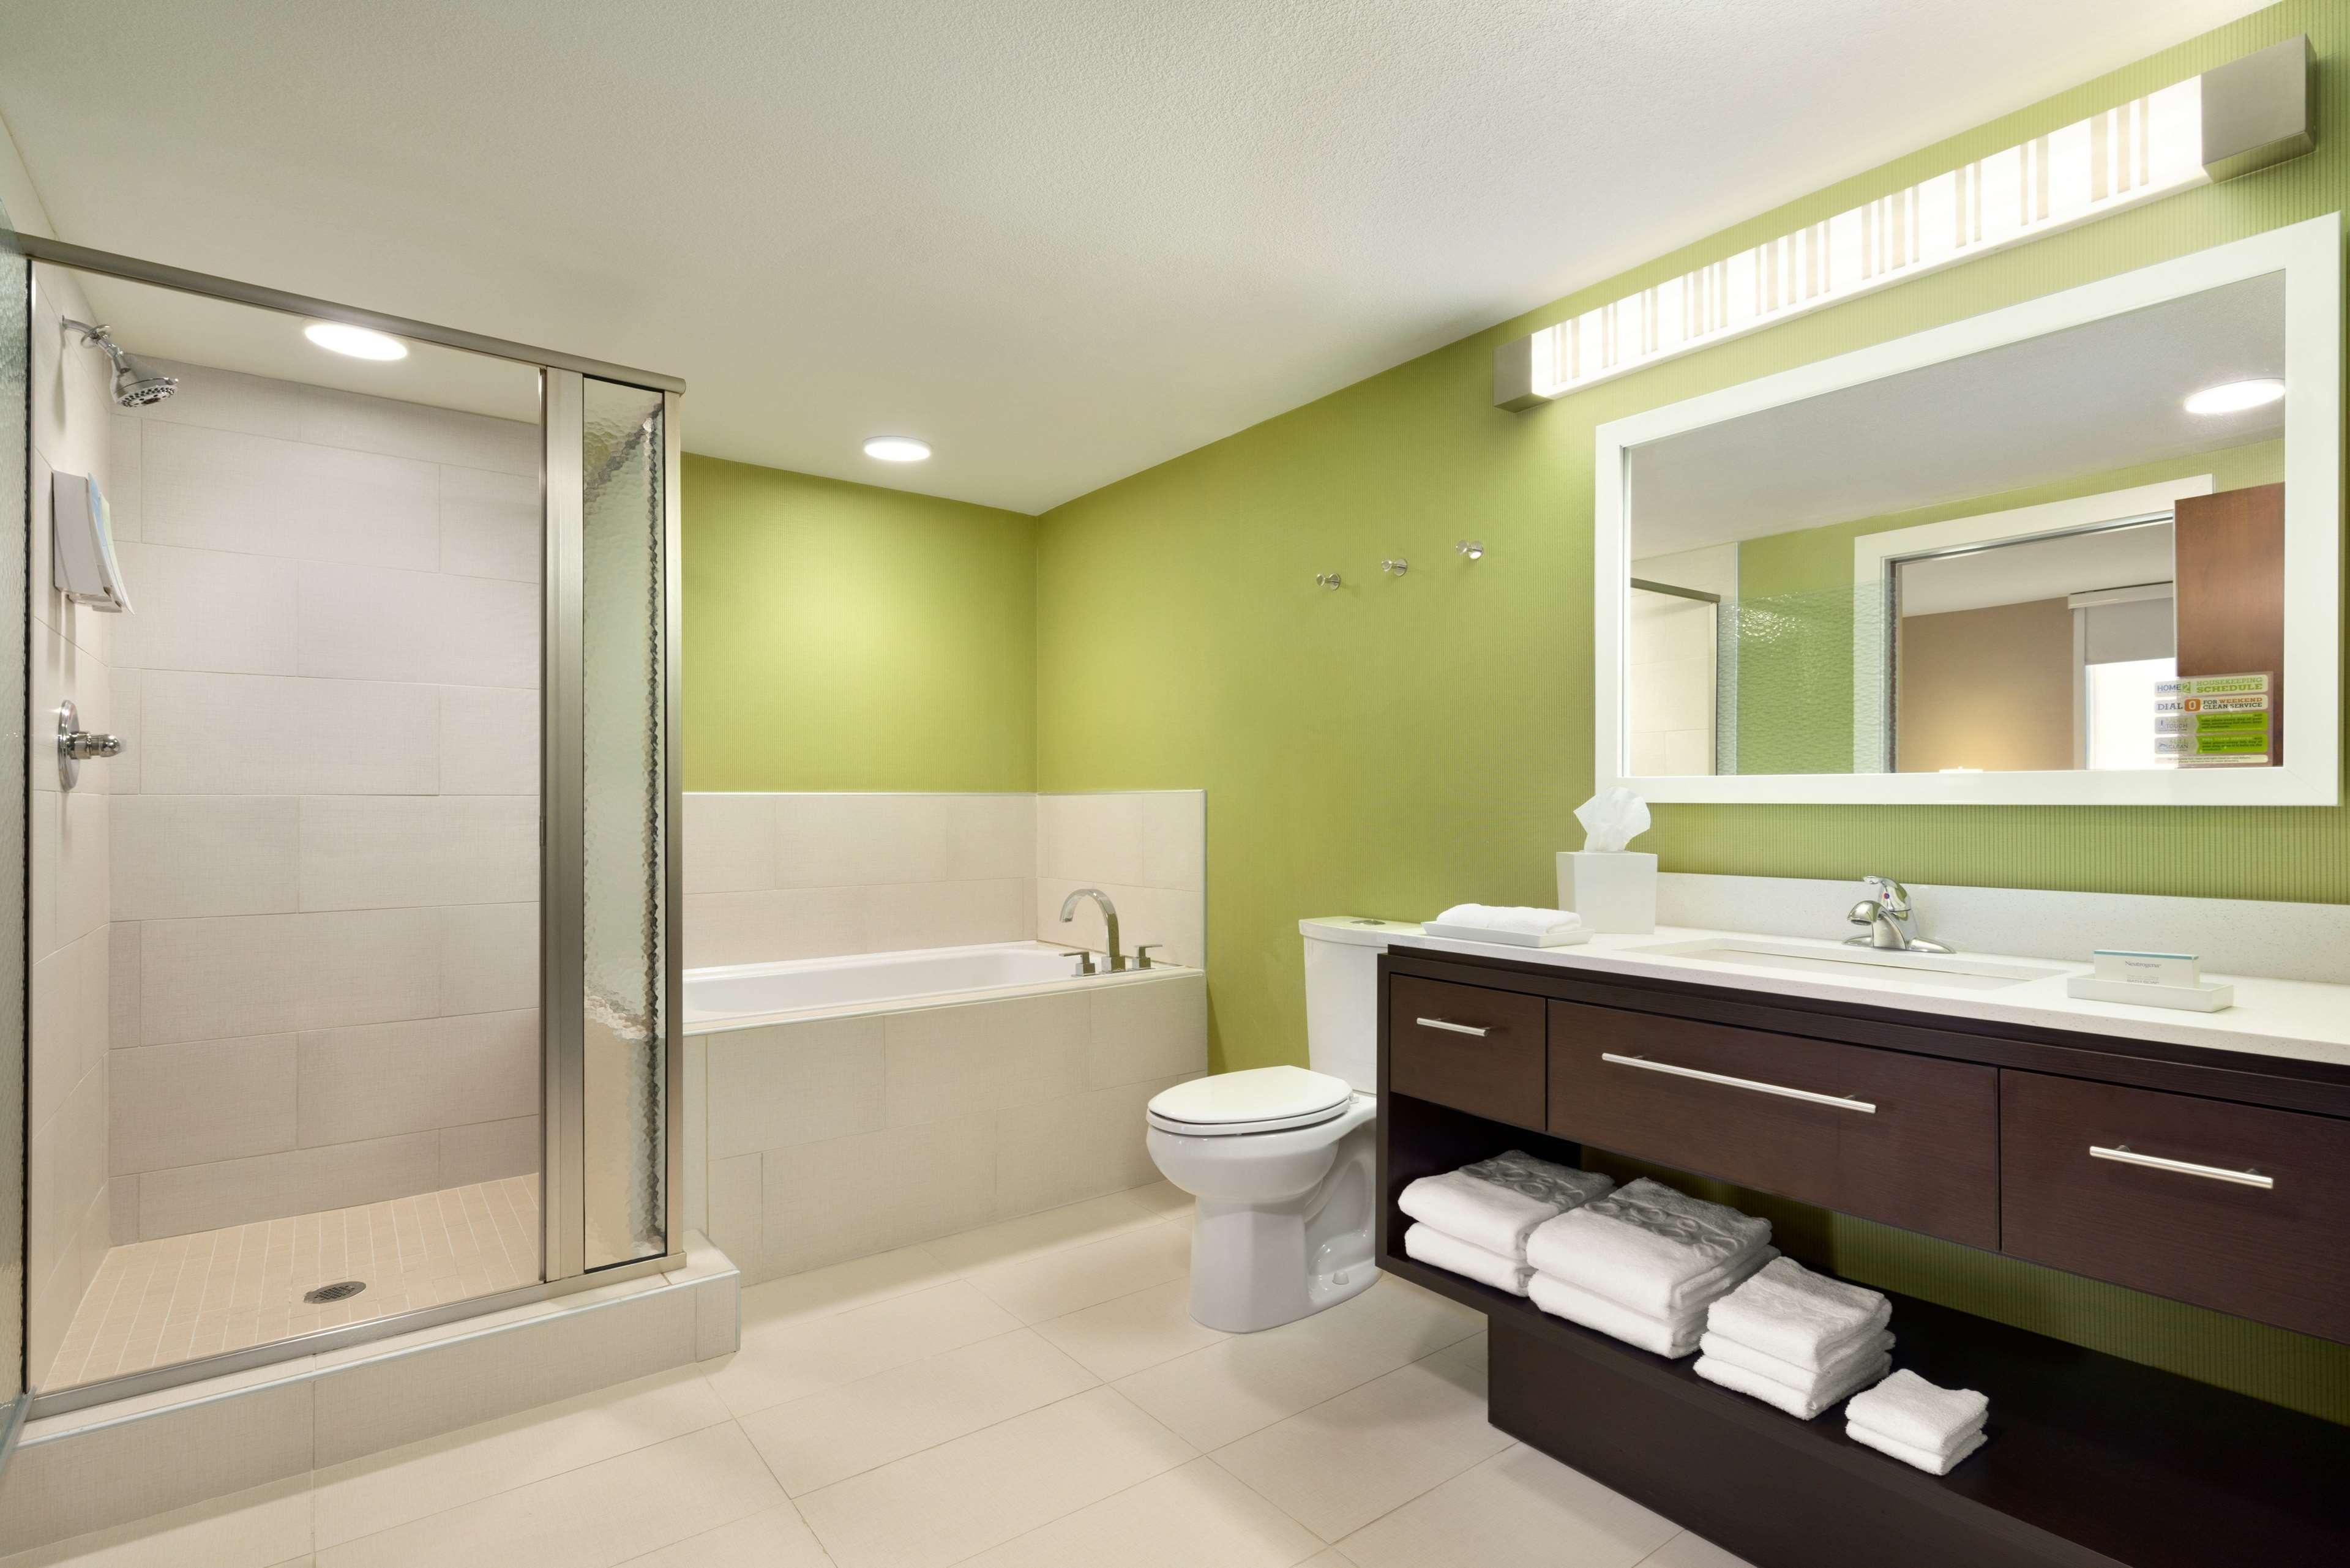 Home2 Suites by Hilton Leavenworth Downtown image 19